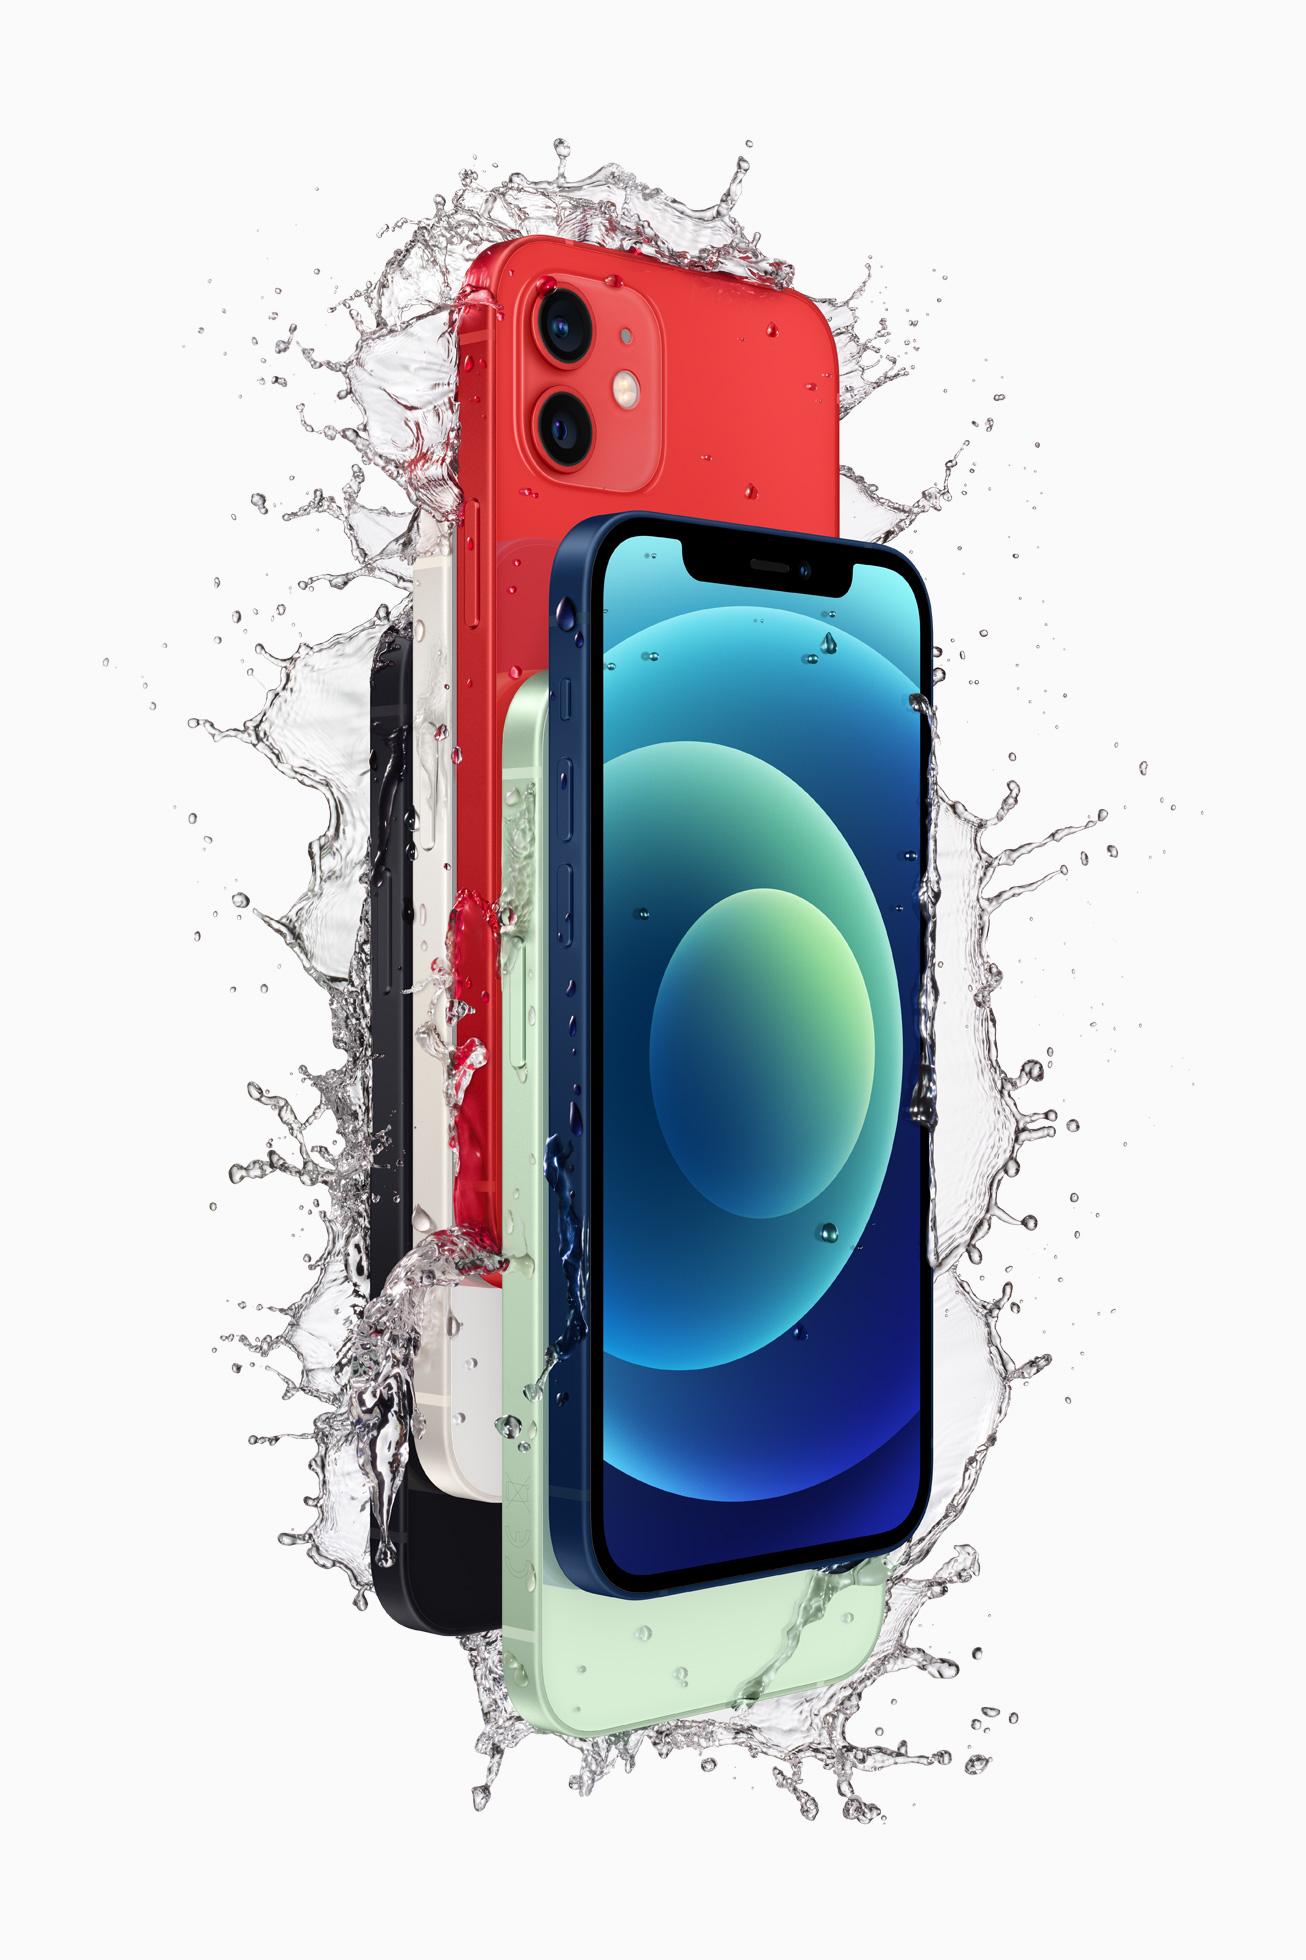 iPhone 12 具备 IP68 级防泼溅性能,可抵御日常液体的泼溅